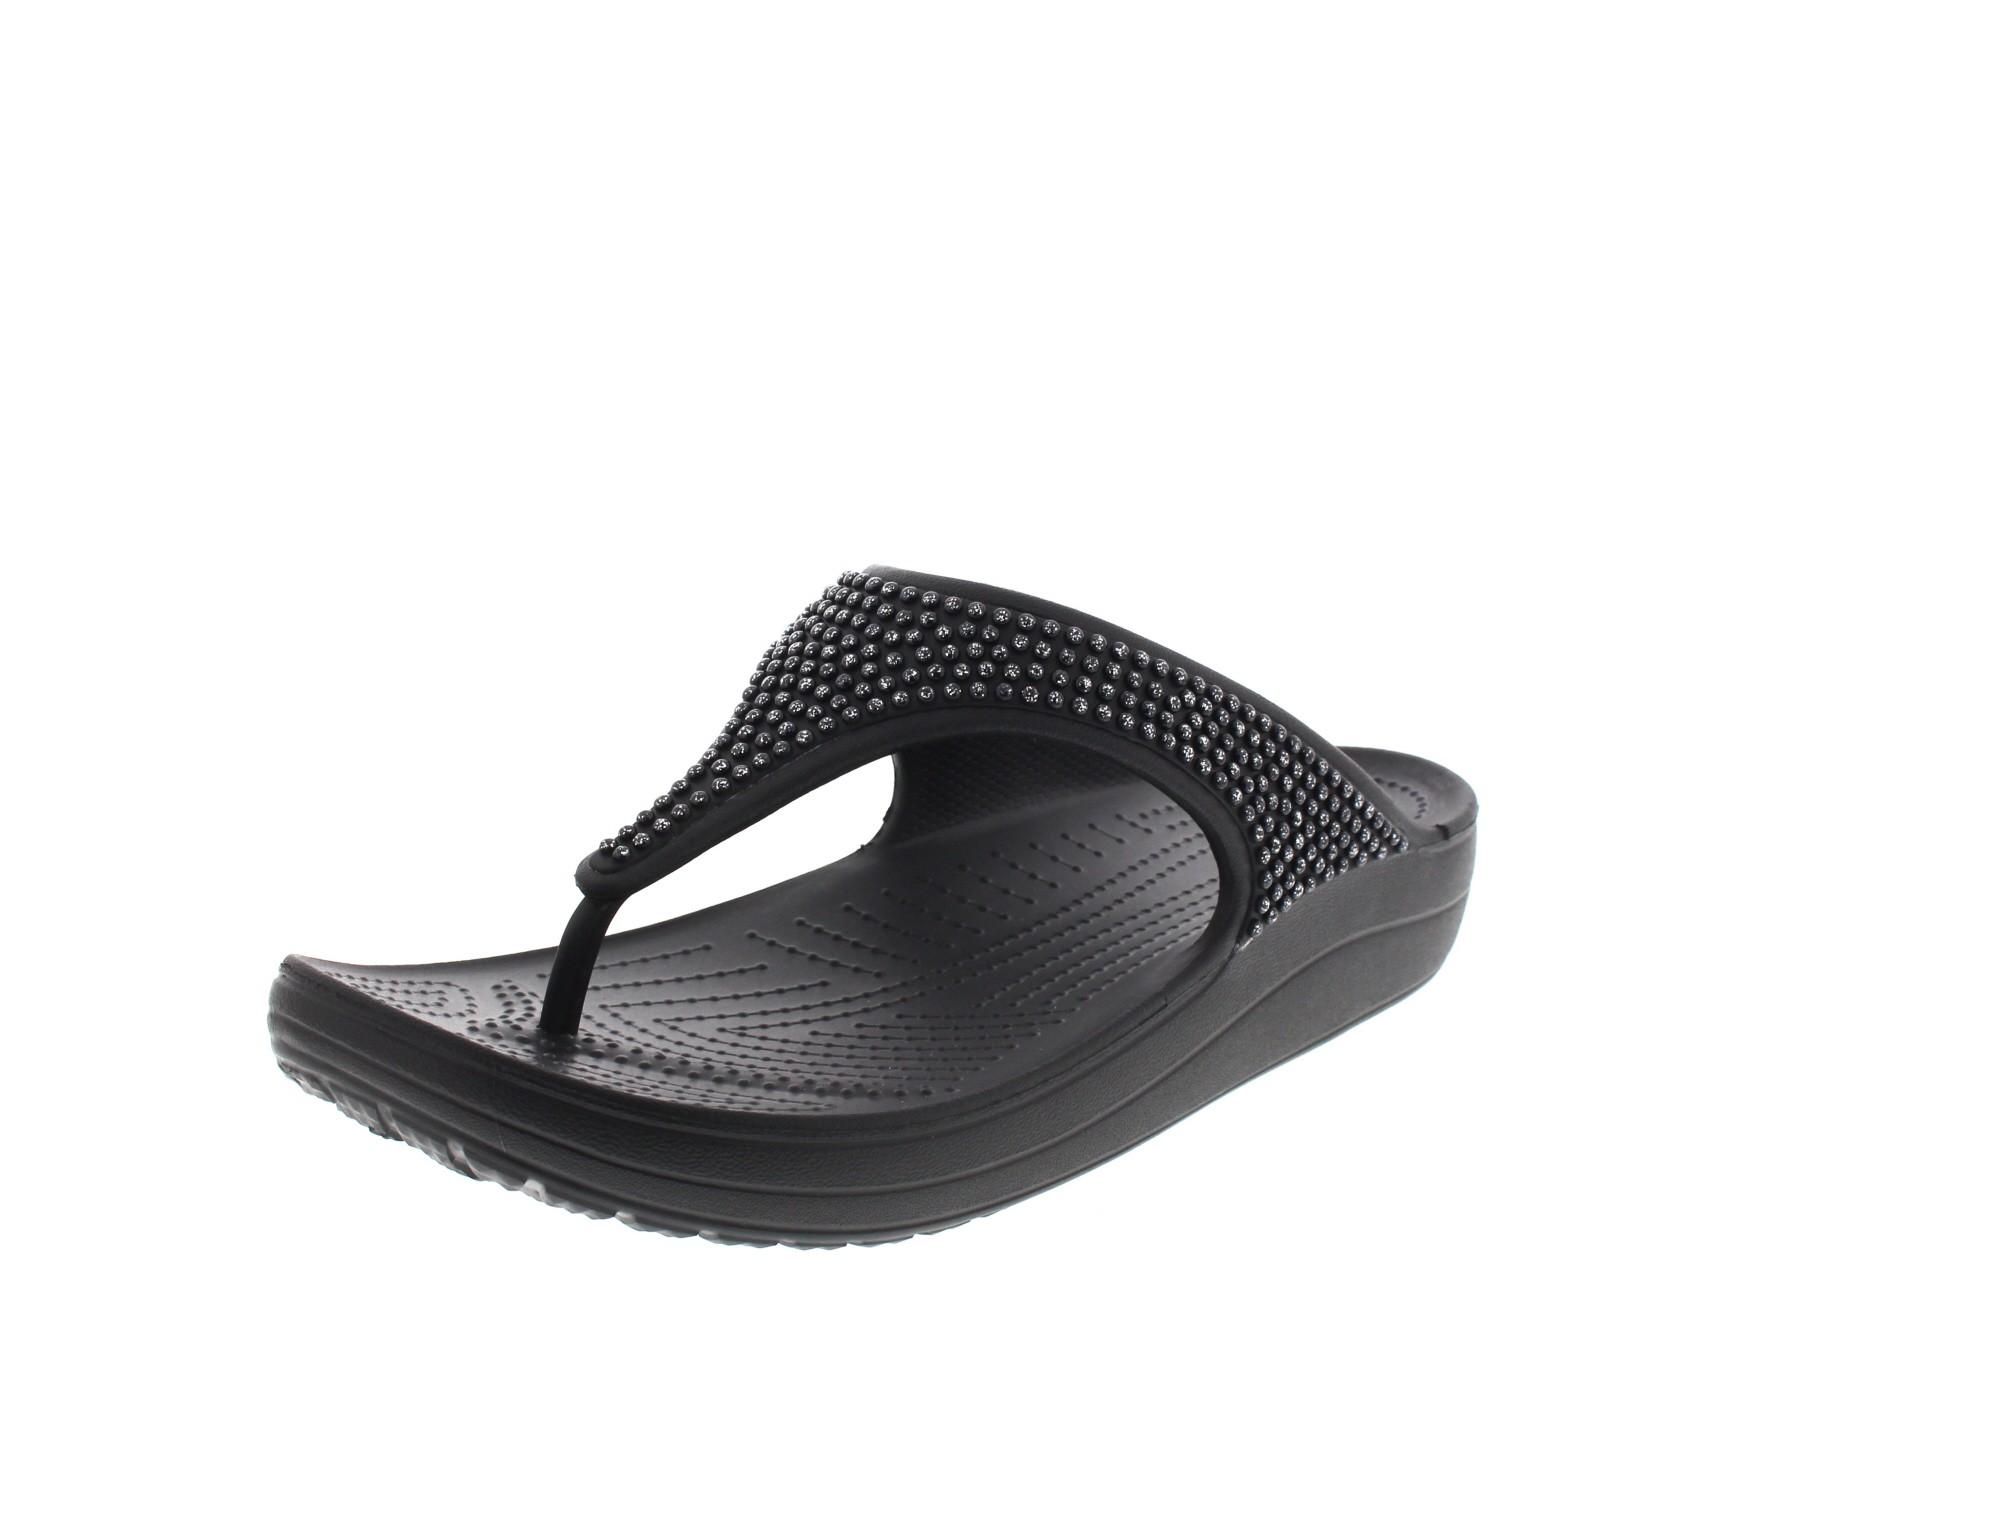 CROCS Schuhe - Zehentrenner SLOANE DIAMANTE FLIP black0-4283